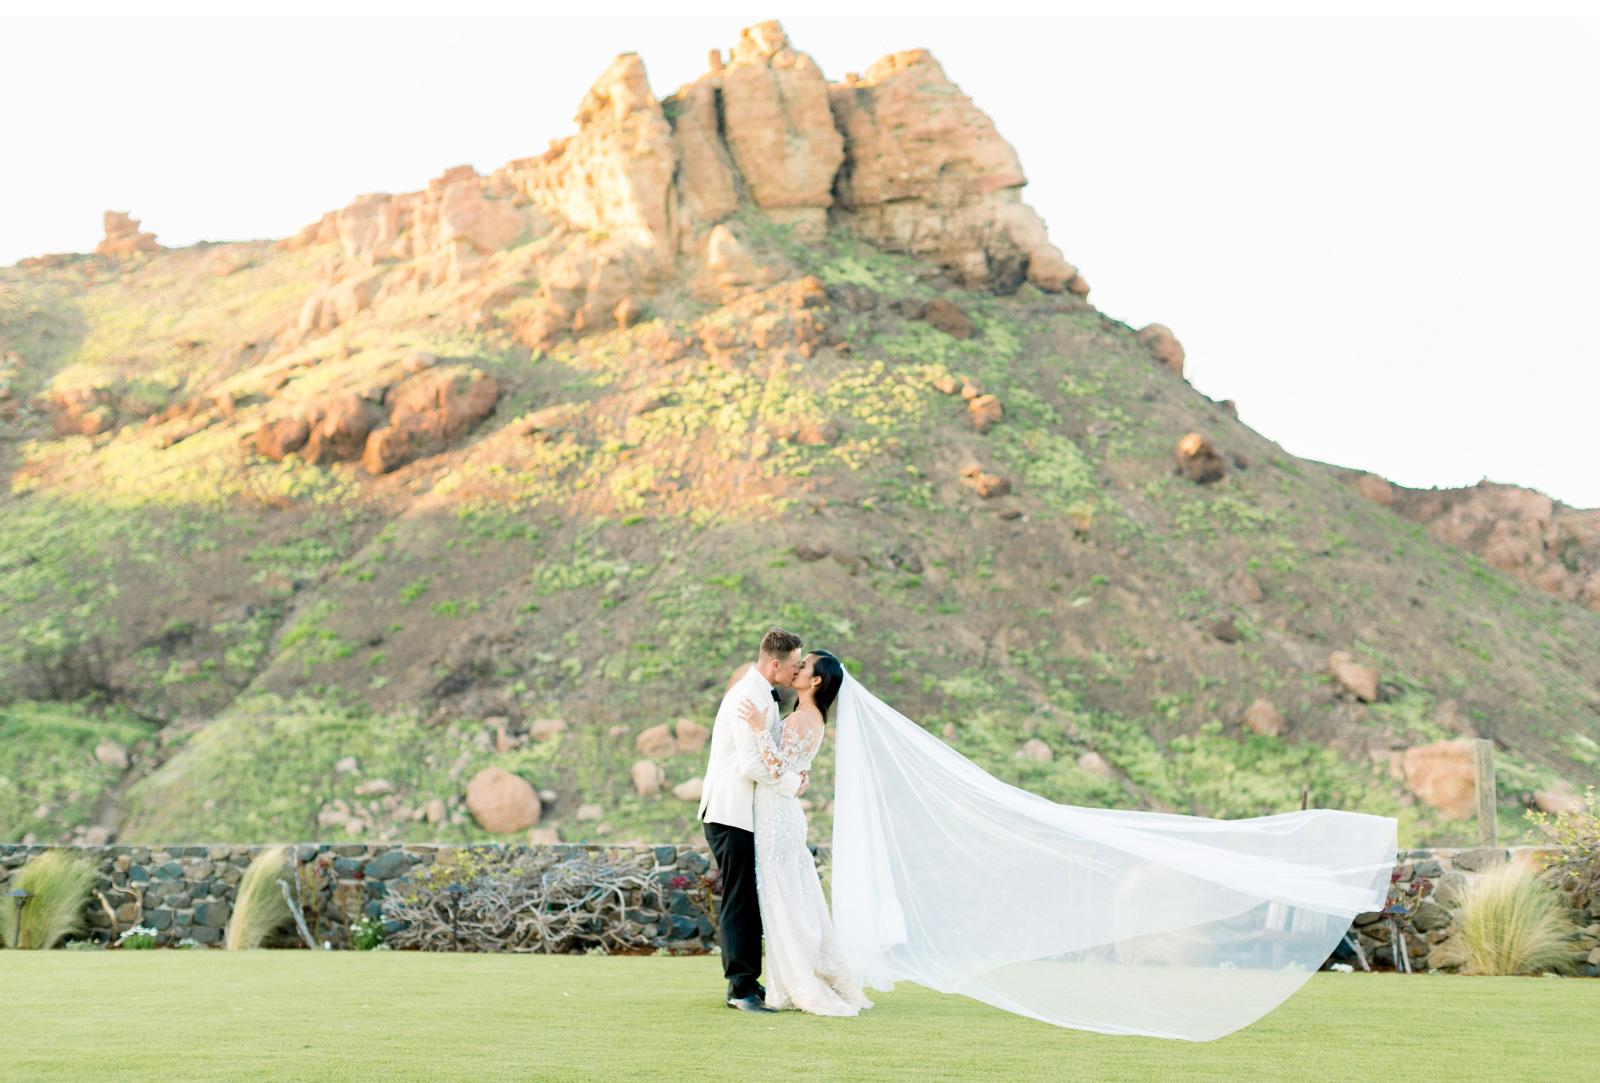 Malibu-Wedding-Photographer-Southern-California-Wedding-Venues-Malibu-Wedding-Photographer-Natalie-Schutt-Photography_11.jpg